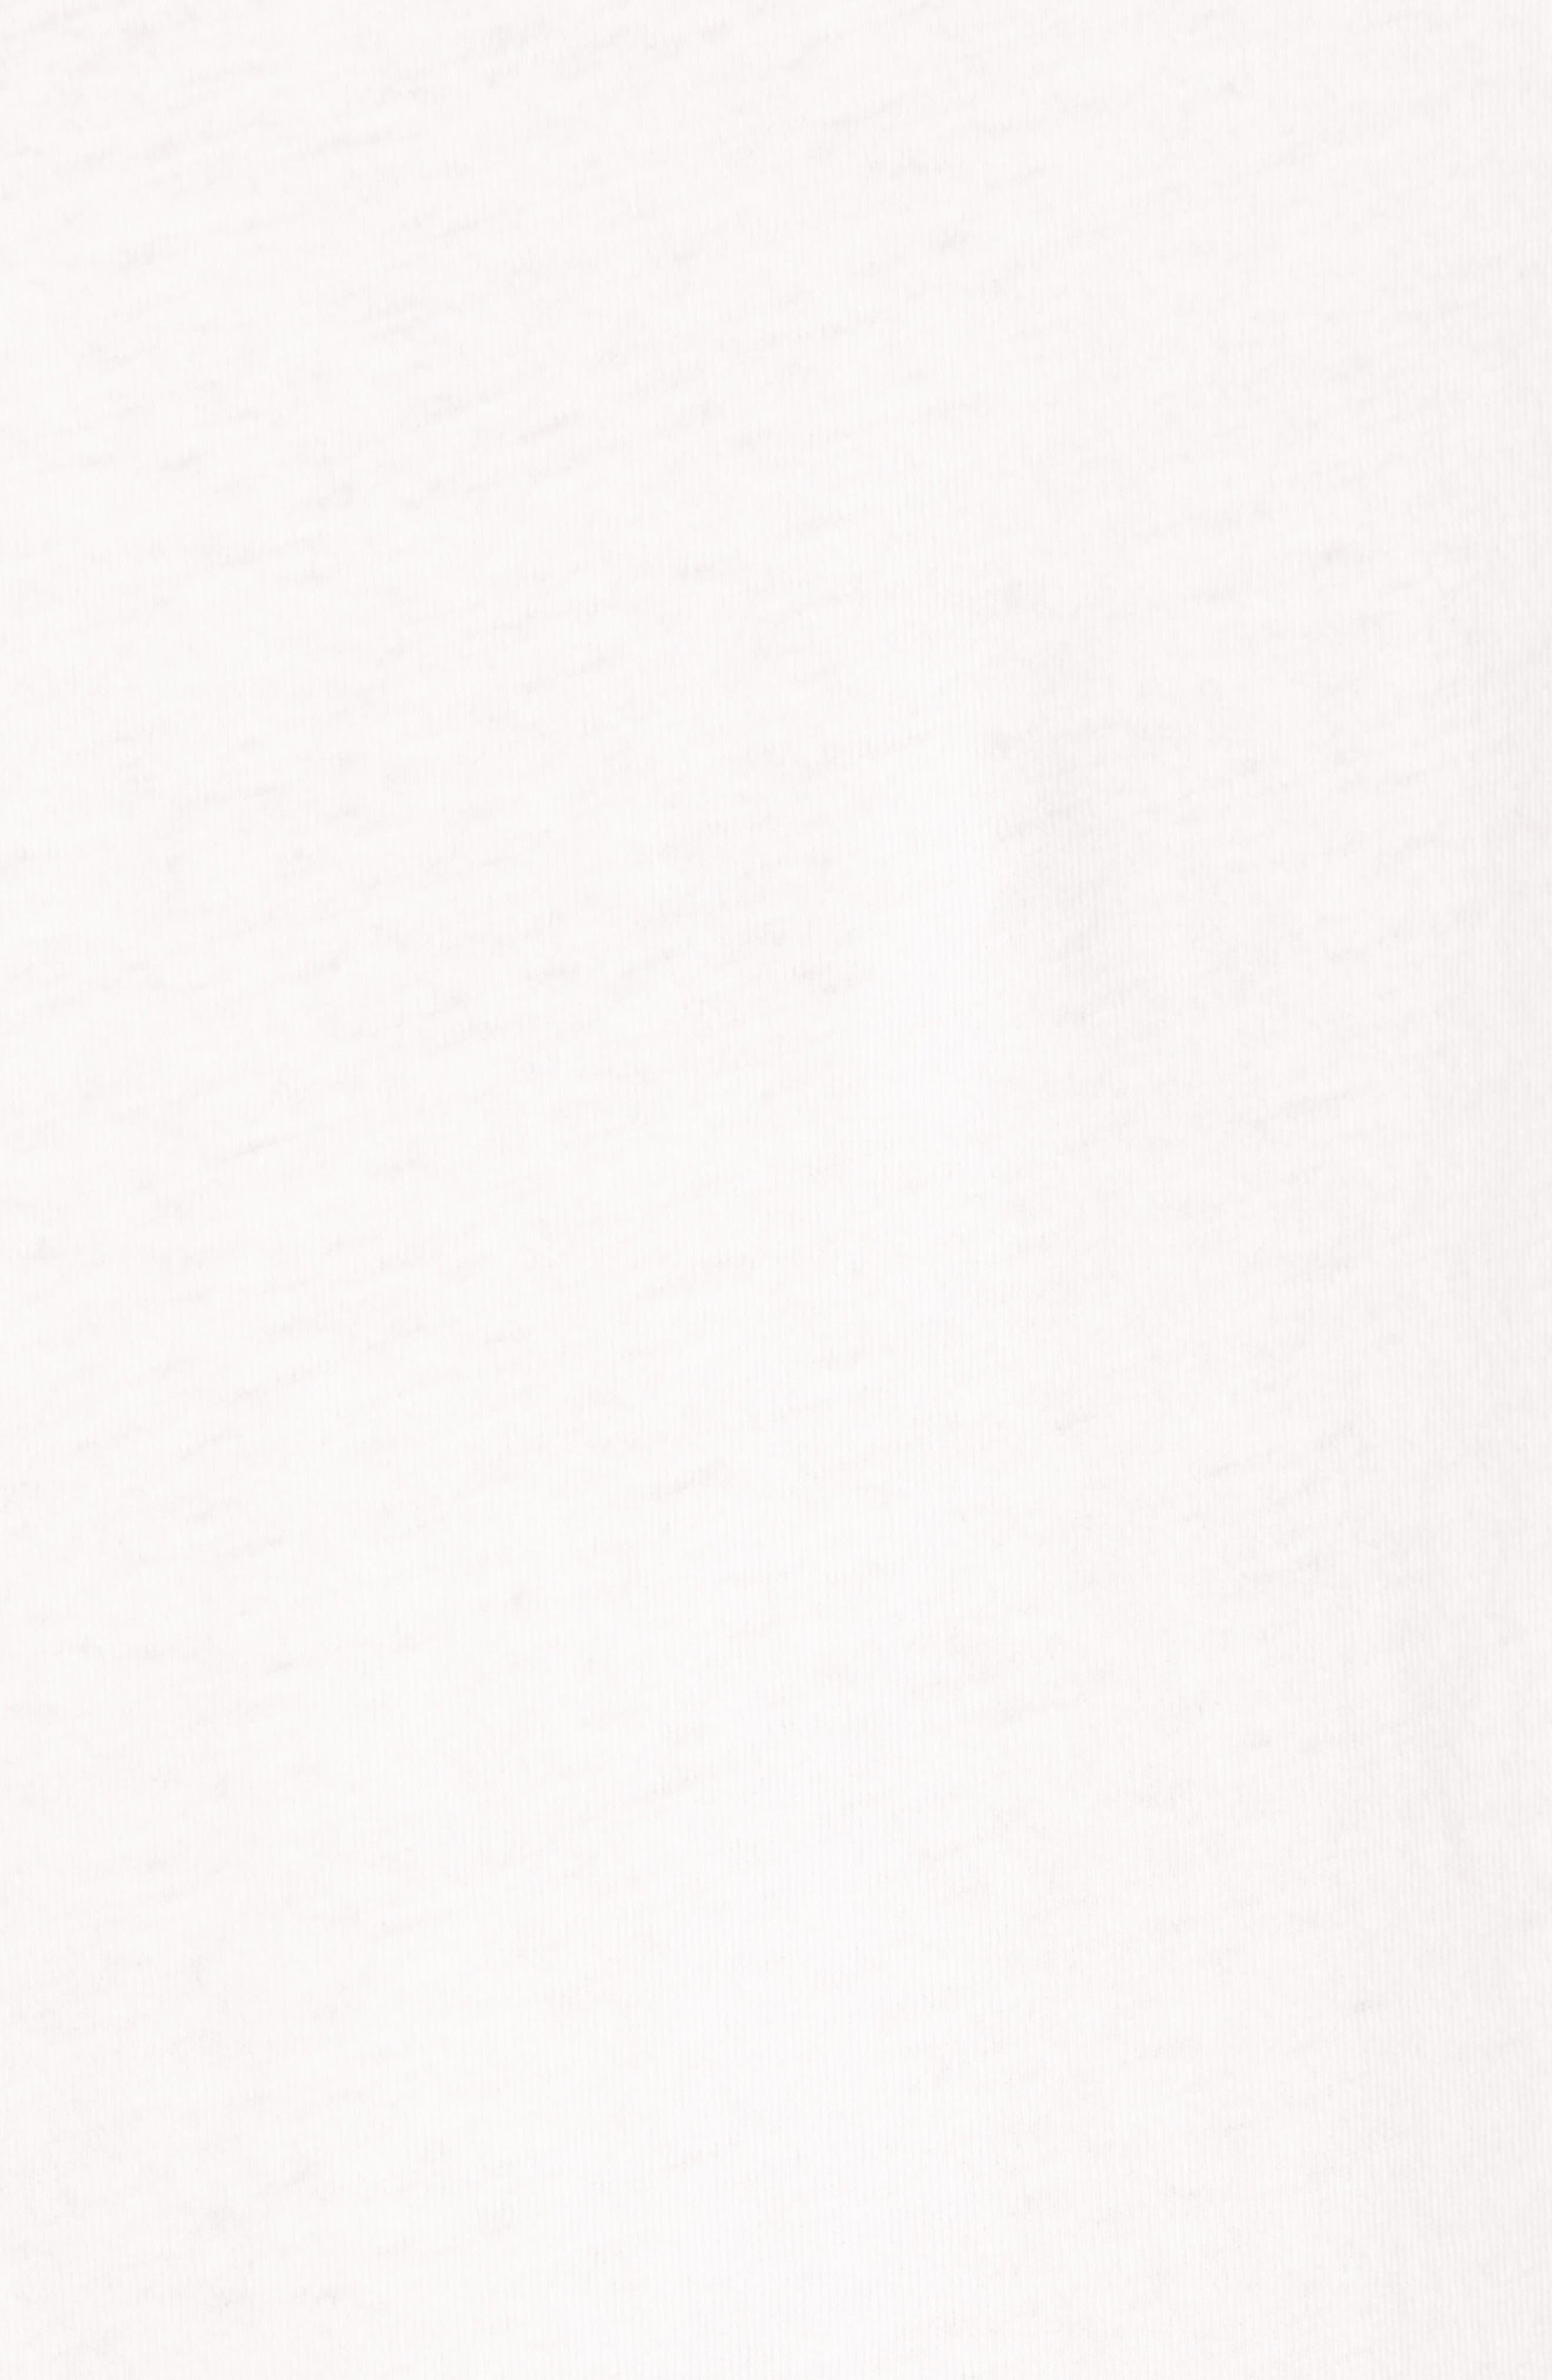 Greene Street Vintage Graphic T-Shirt,                             Alternate thumbnail 5, color,                             Off White